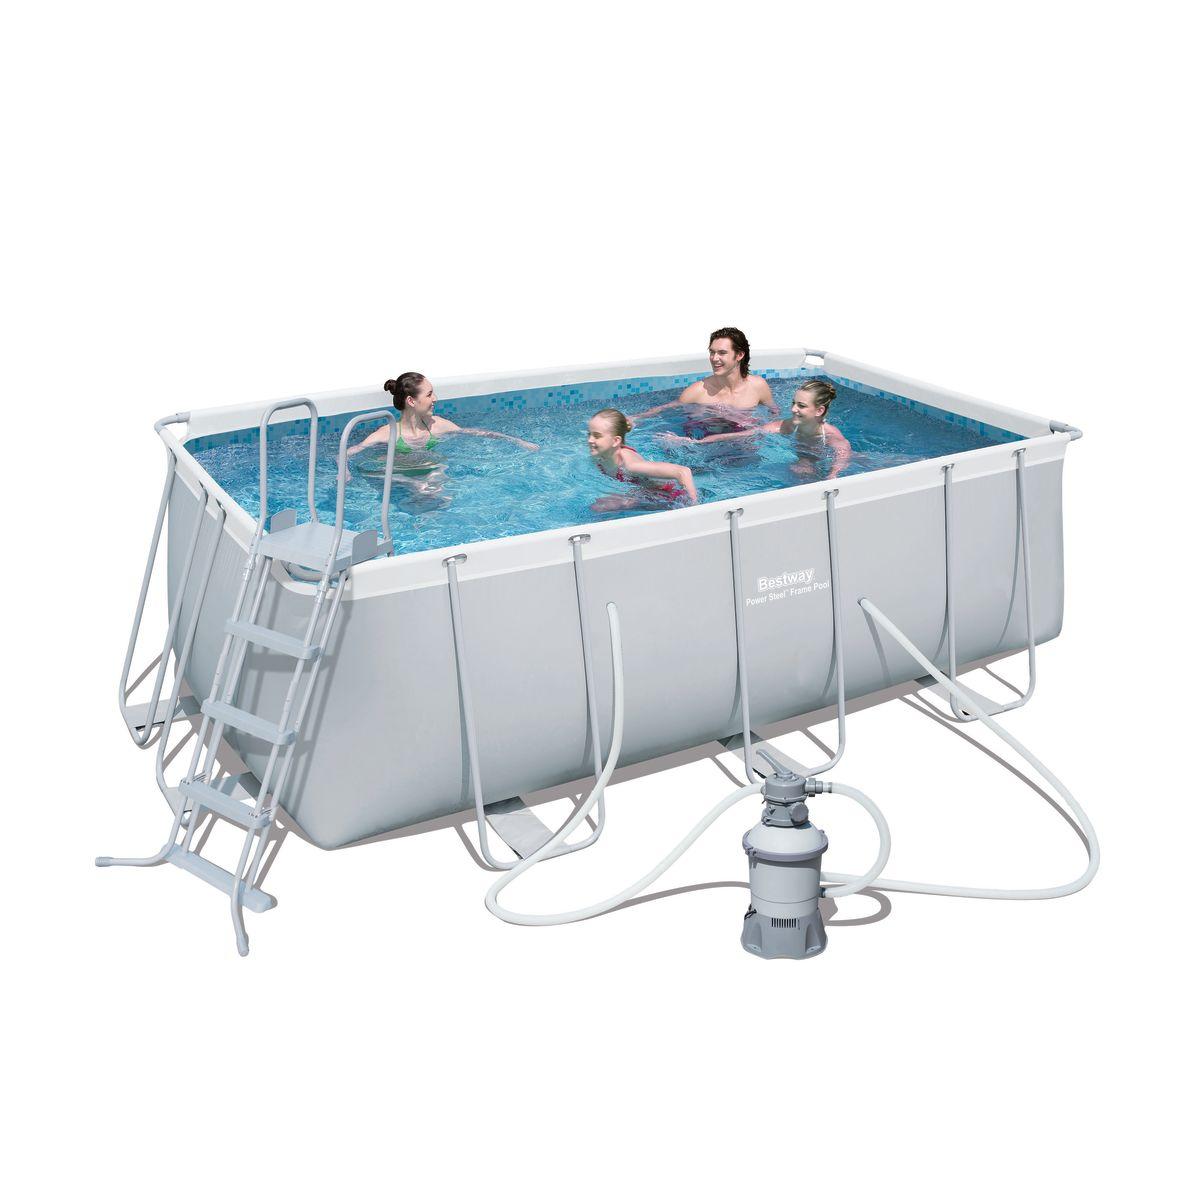 Moda vasca idromassaggio esterno leroy merlin oh24 pineglen - Offerte piscine fuori terra ...